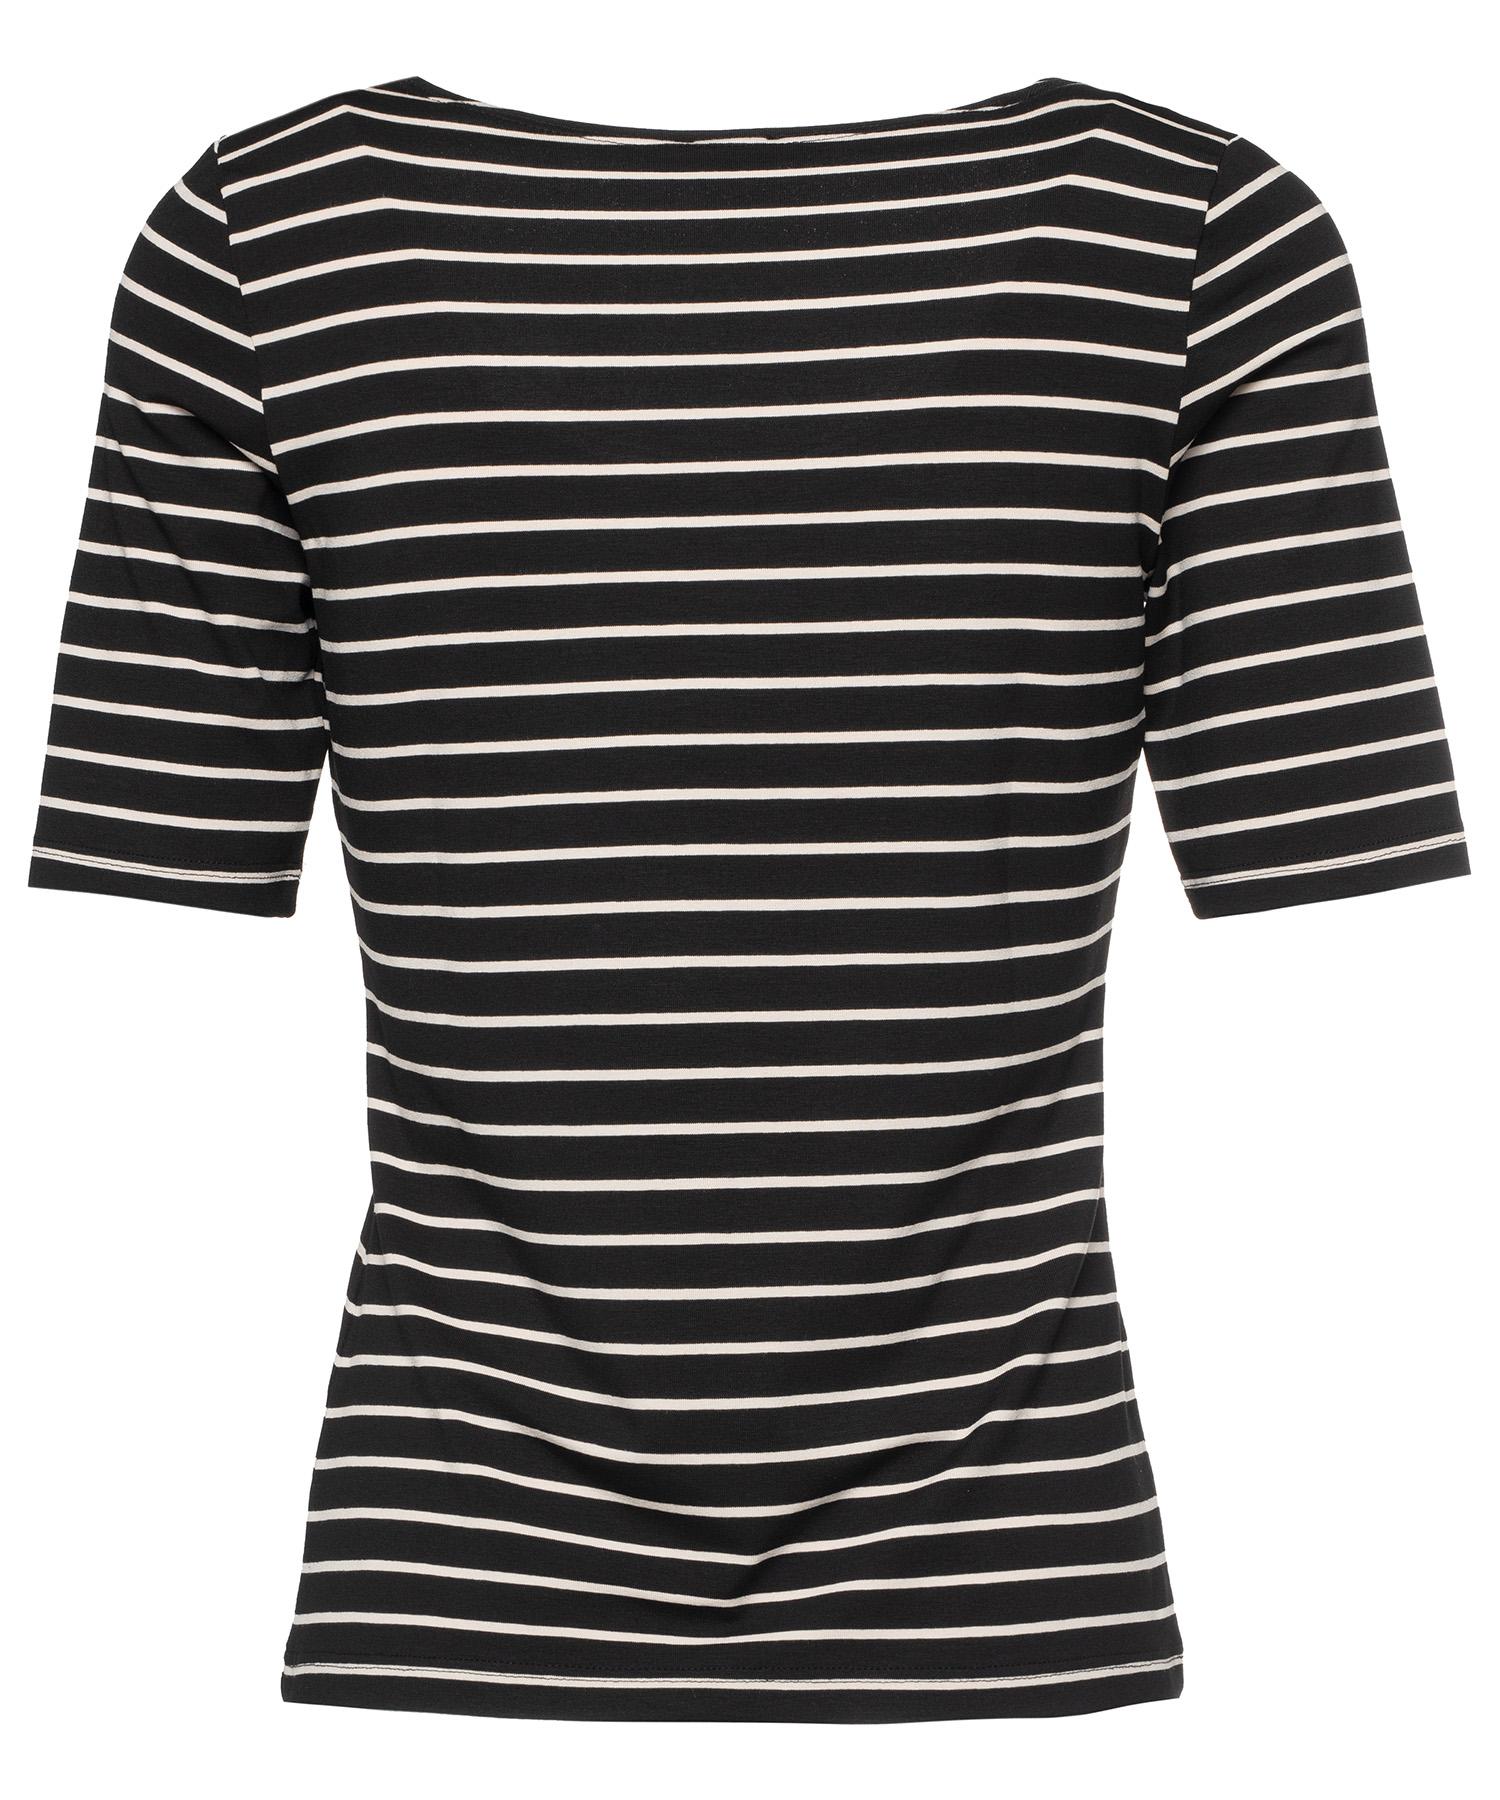 No Man's Land streep shirt